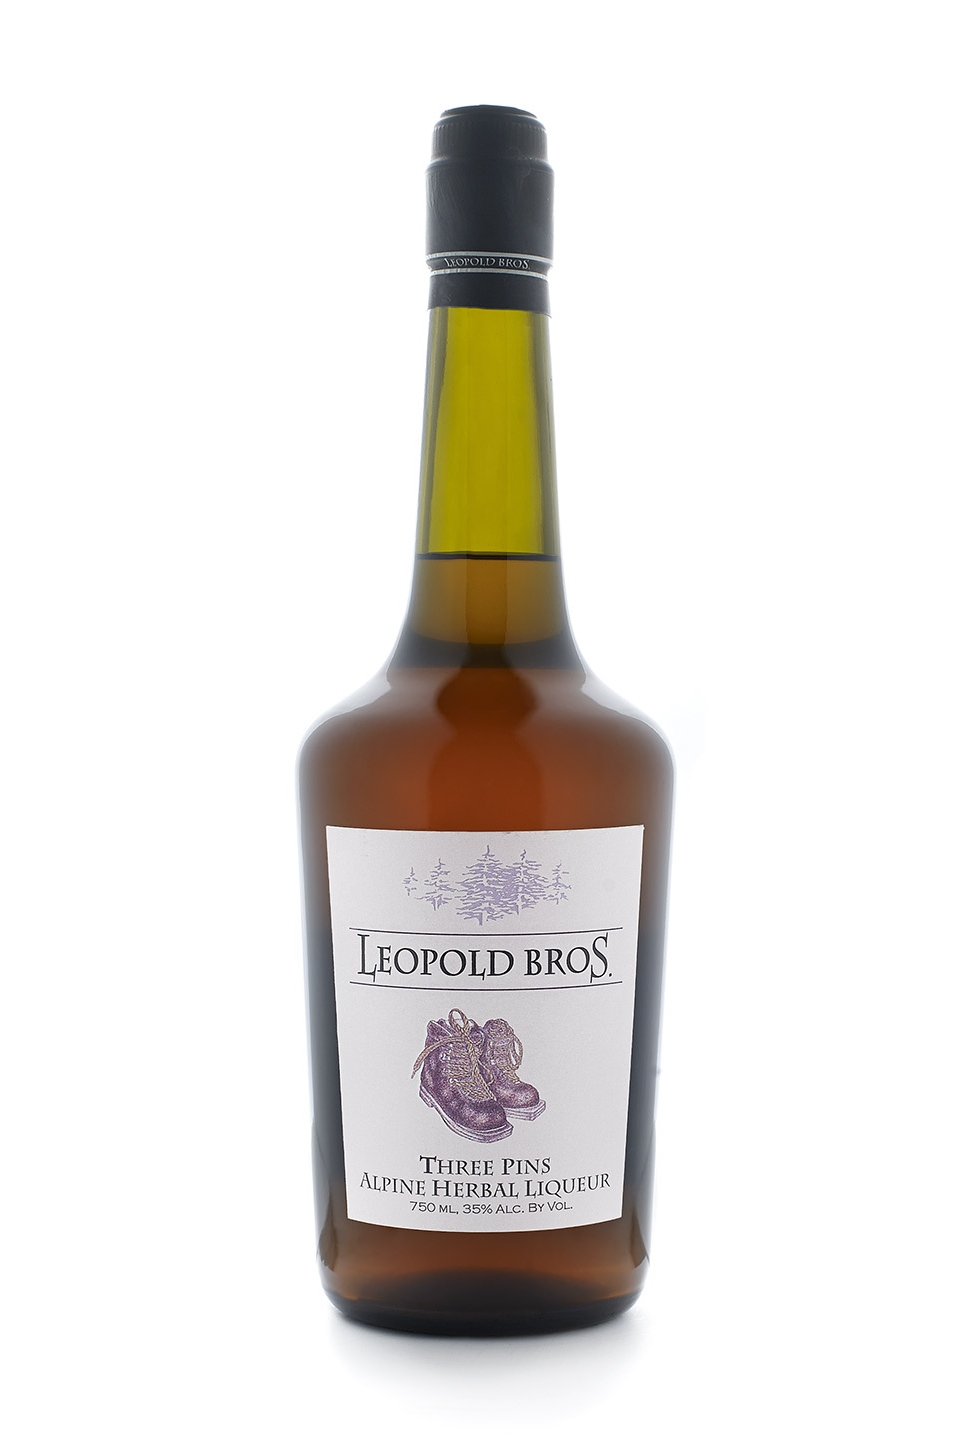 Three Pins Alpine Herbal Liqueur